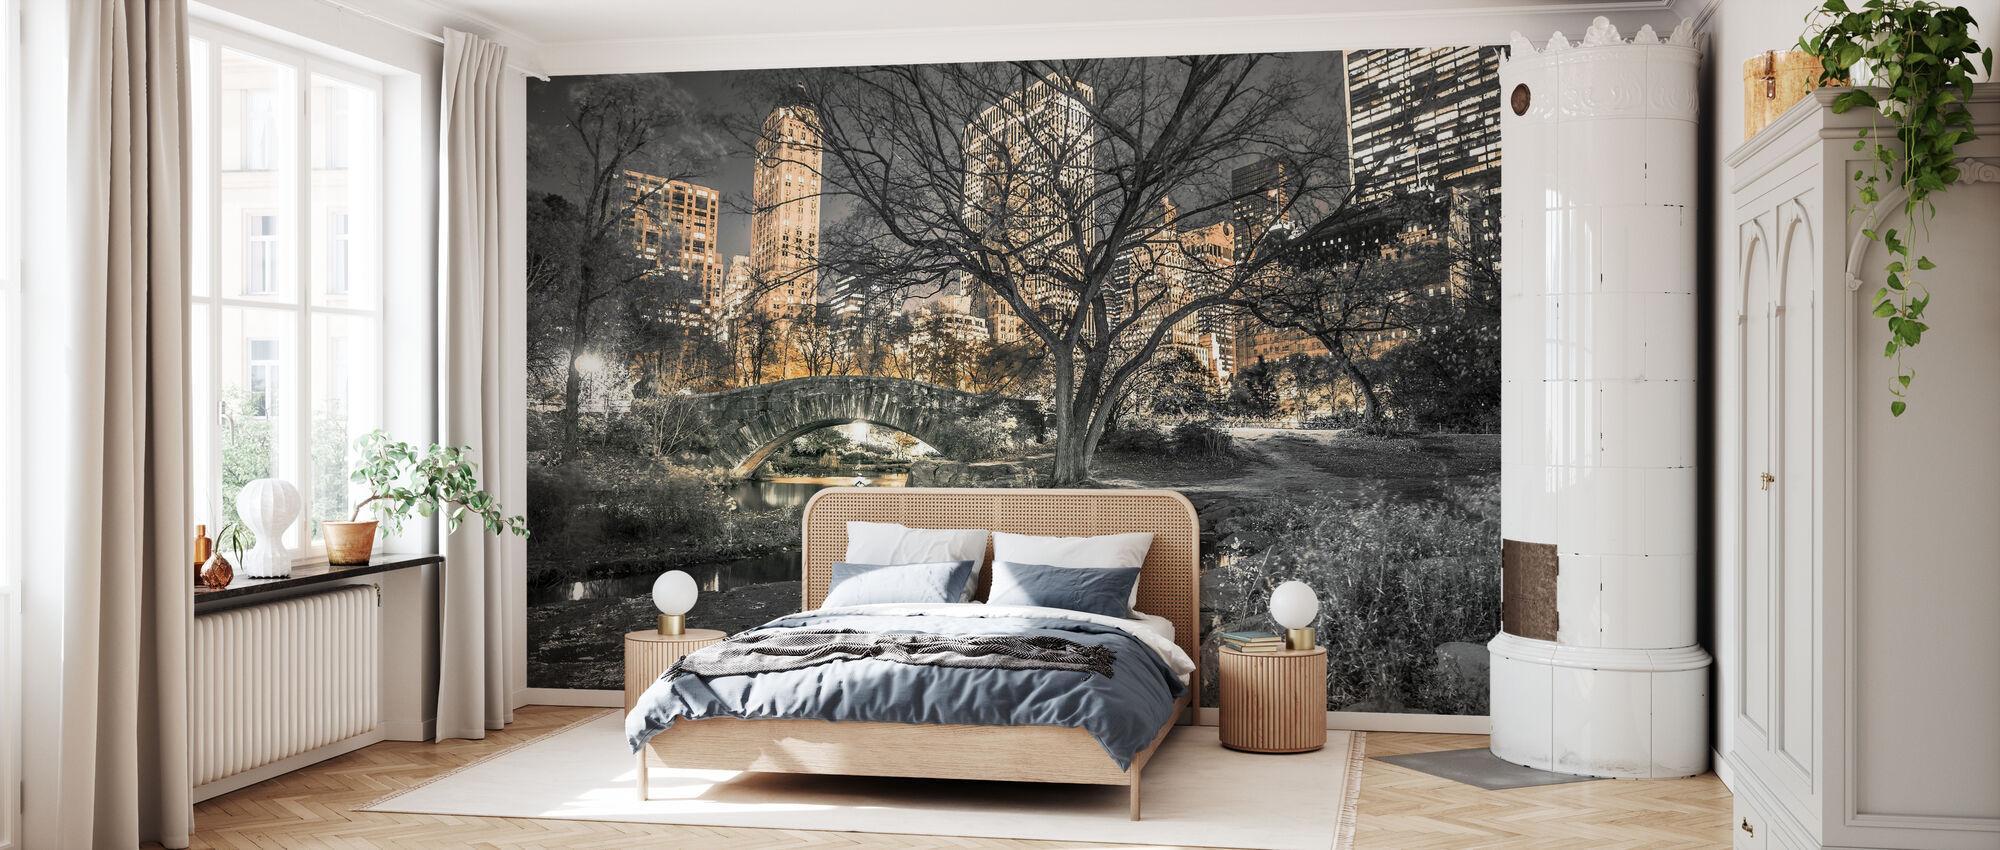 New York - Central Park - Wallpaper - Bedroom